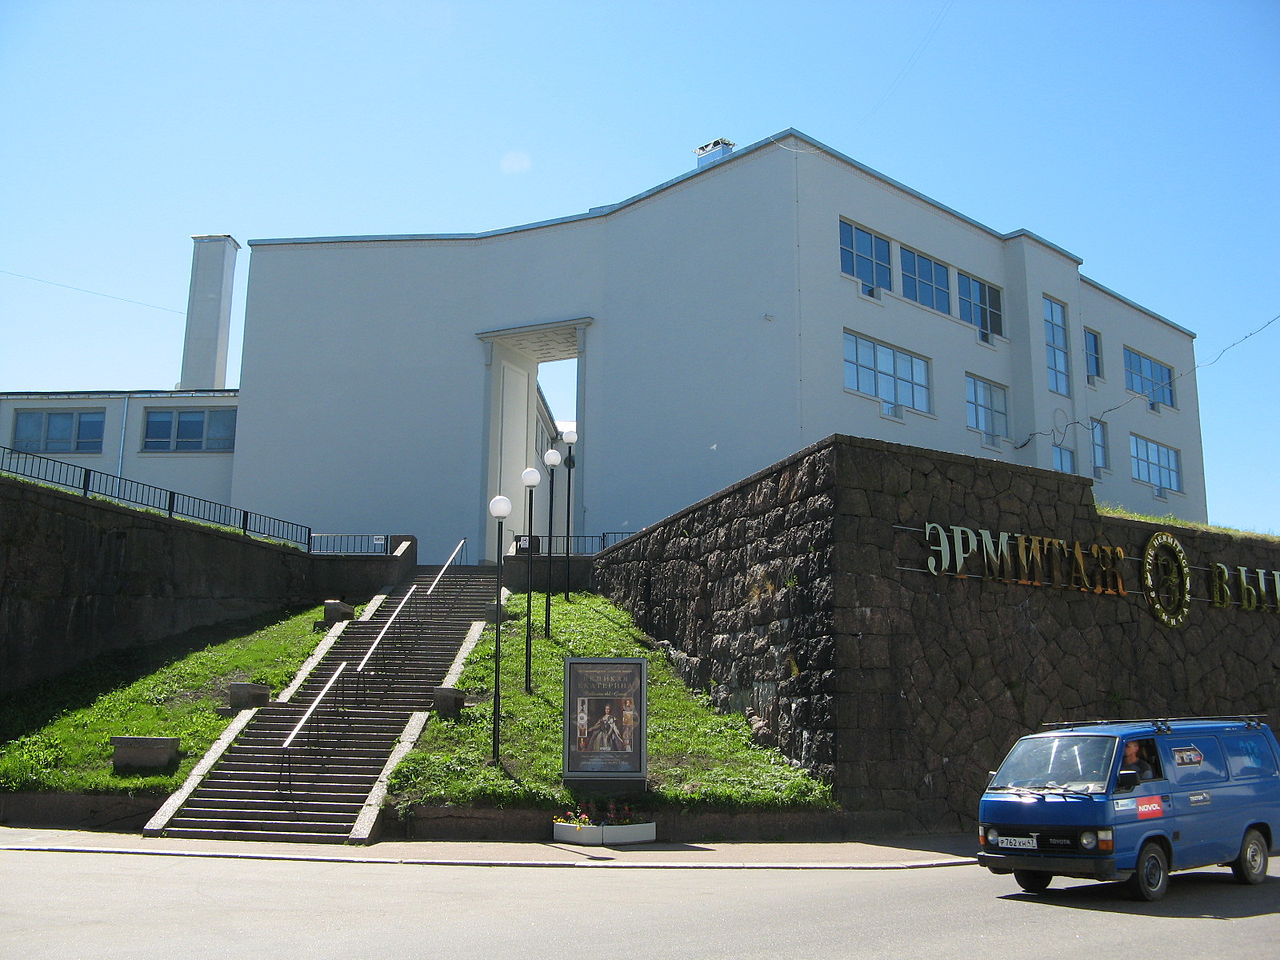 "Музейный центр ""Эрмитаж-Выборг"". Автор фото: Милашин П. А. (Wikimedia Commons)"